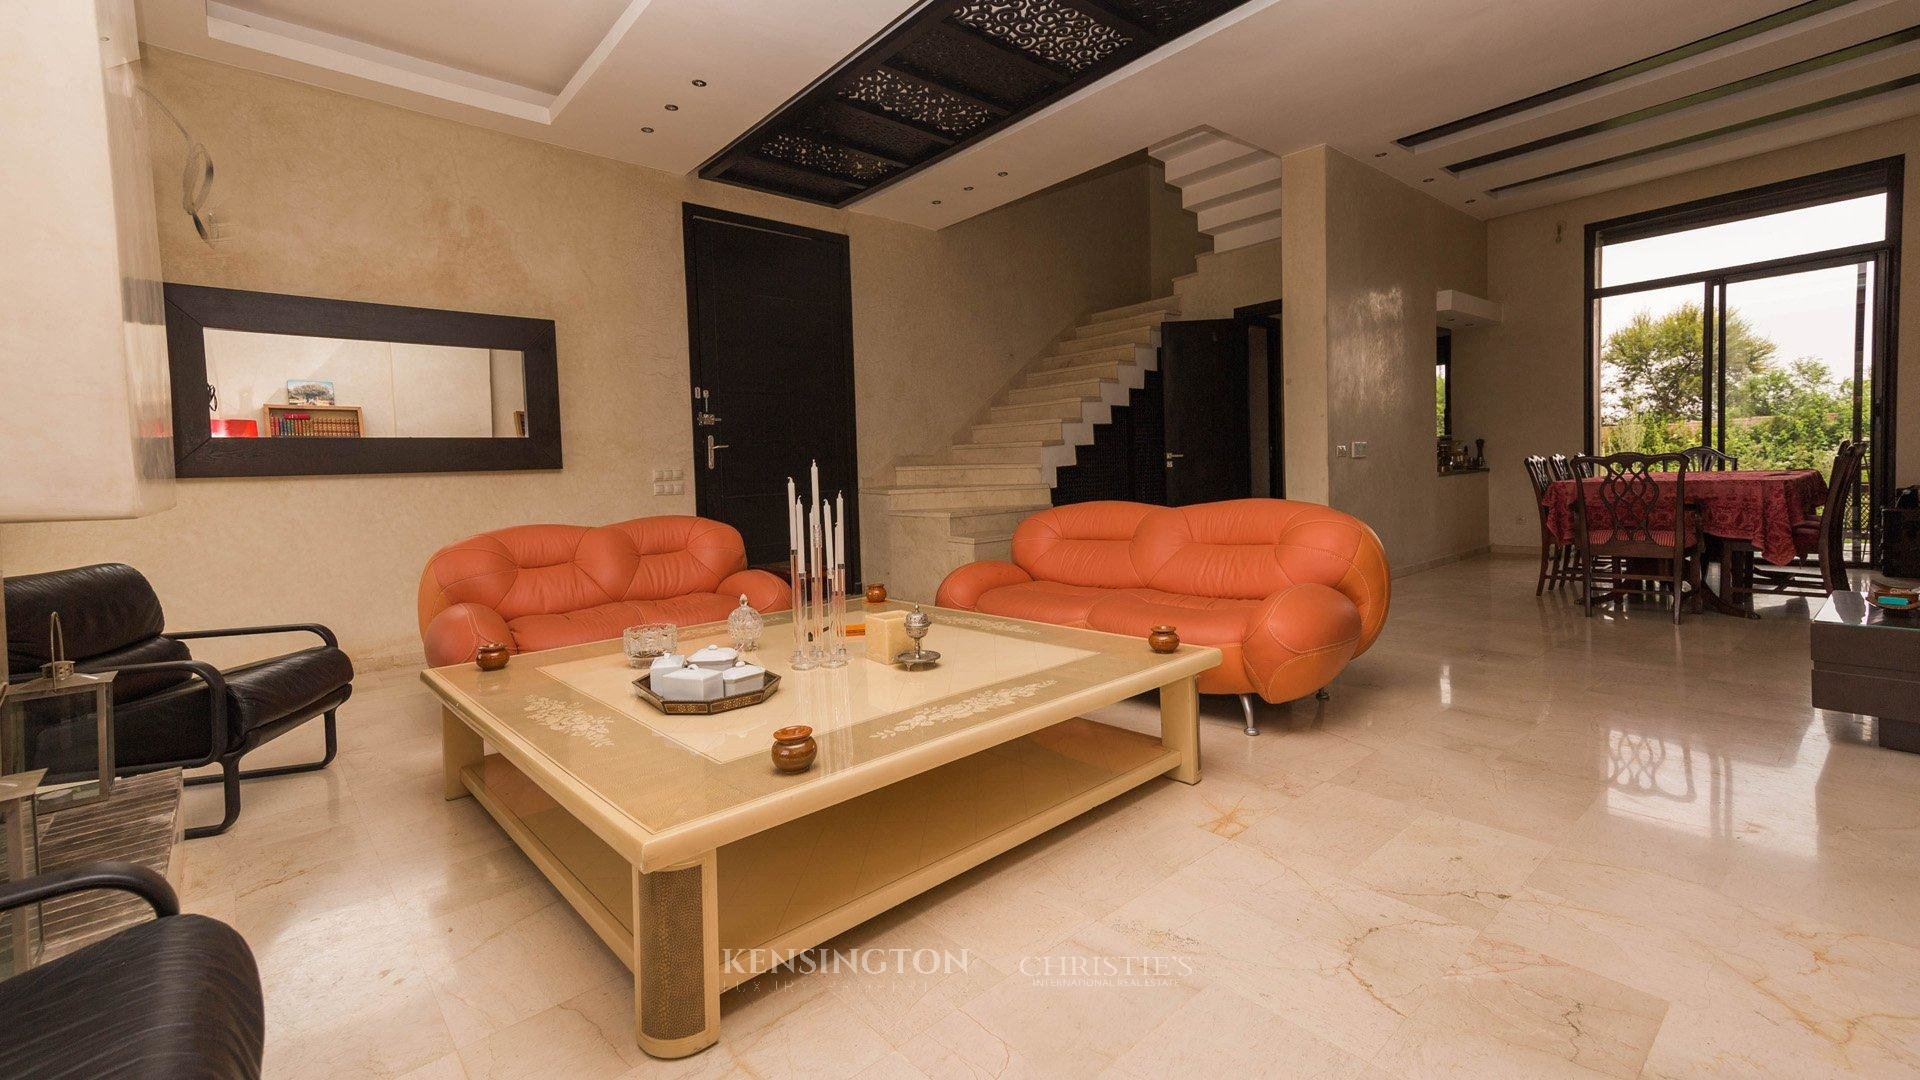 KPPM00856: Villa Henia Luxury Villa Marrakech Morocco